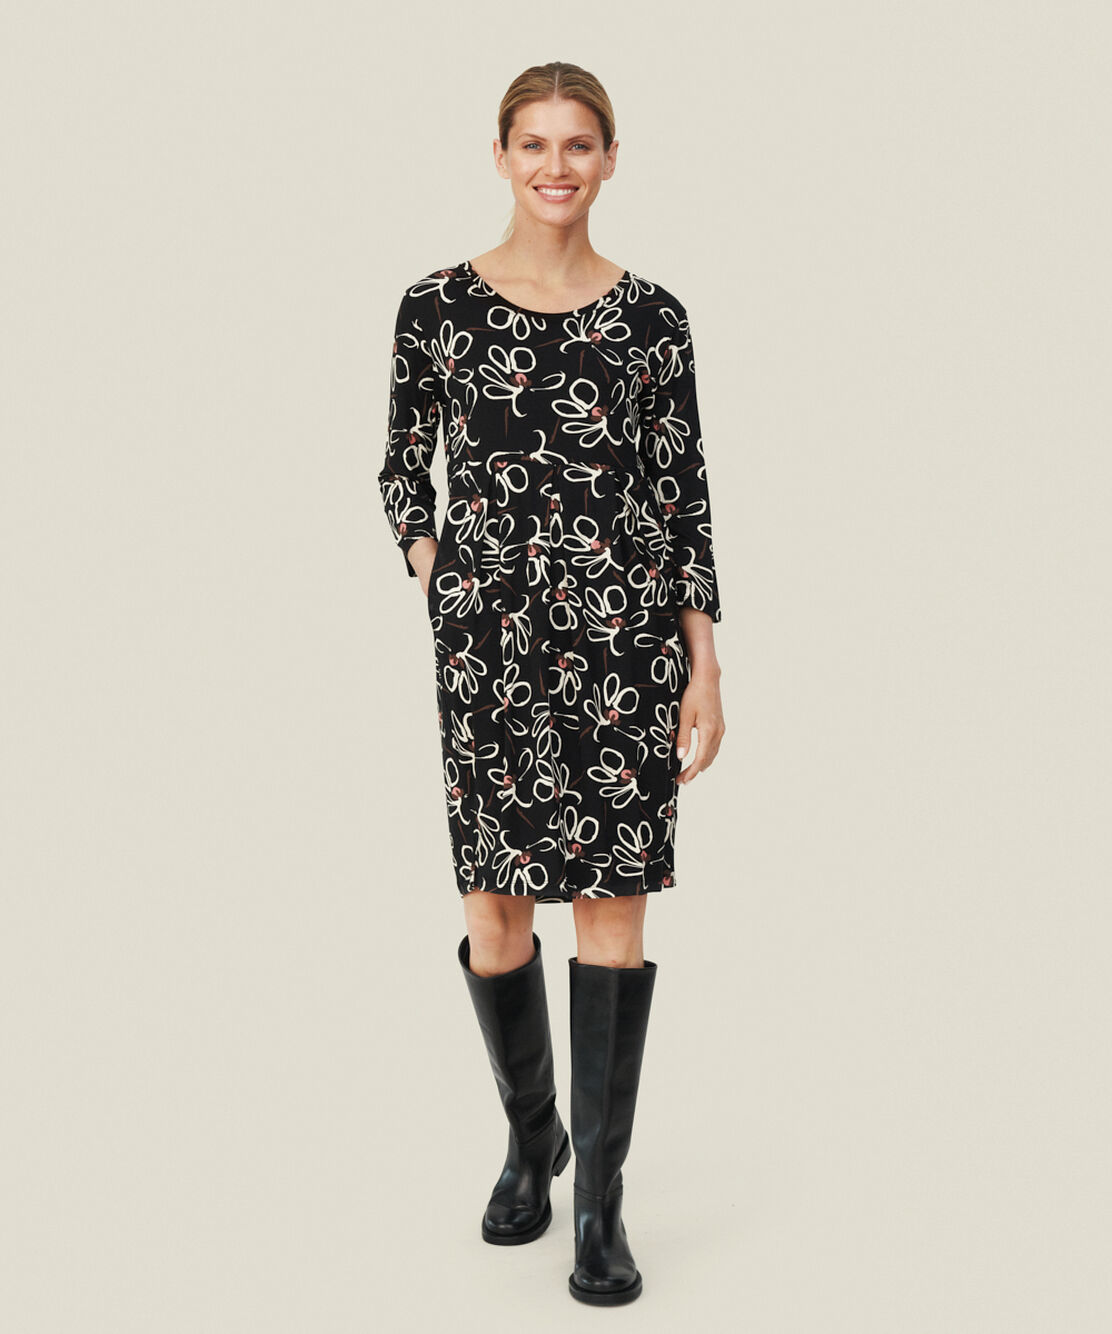 NOMA JERSEY DRESS, Dusty Rose, hi-res